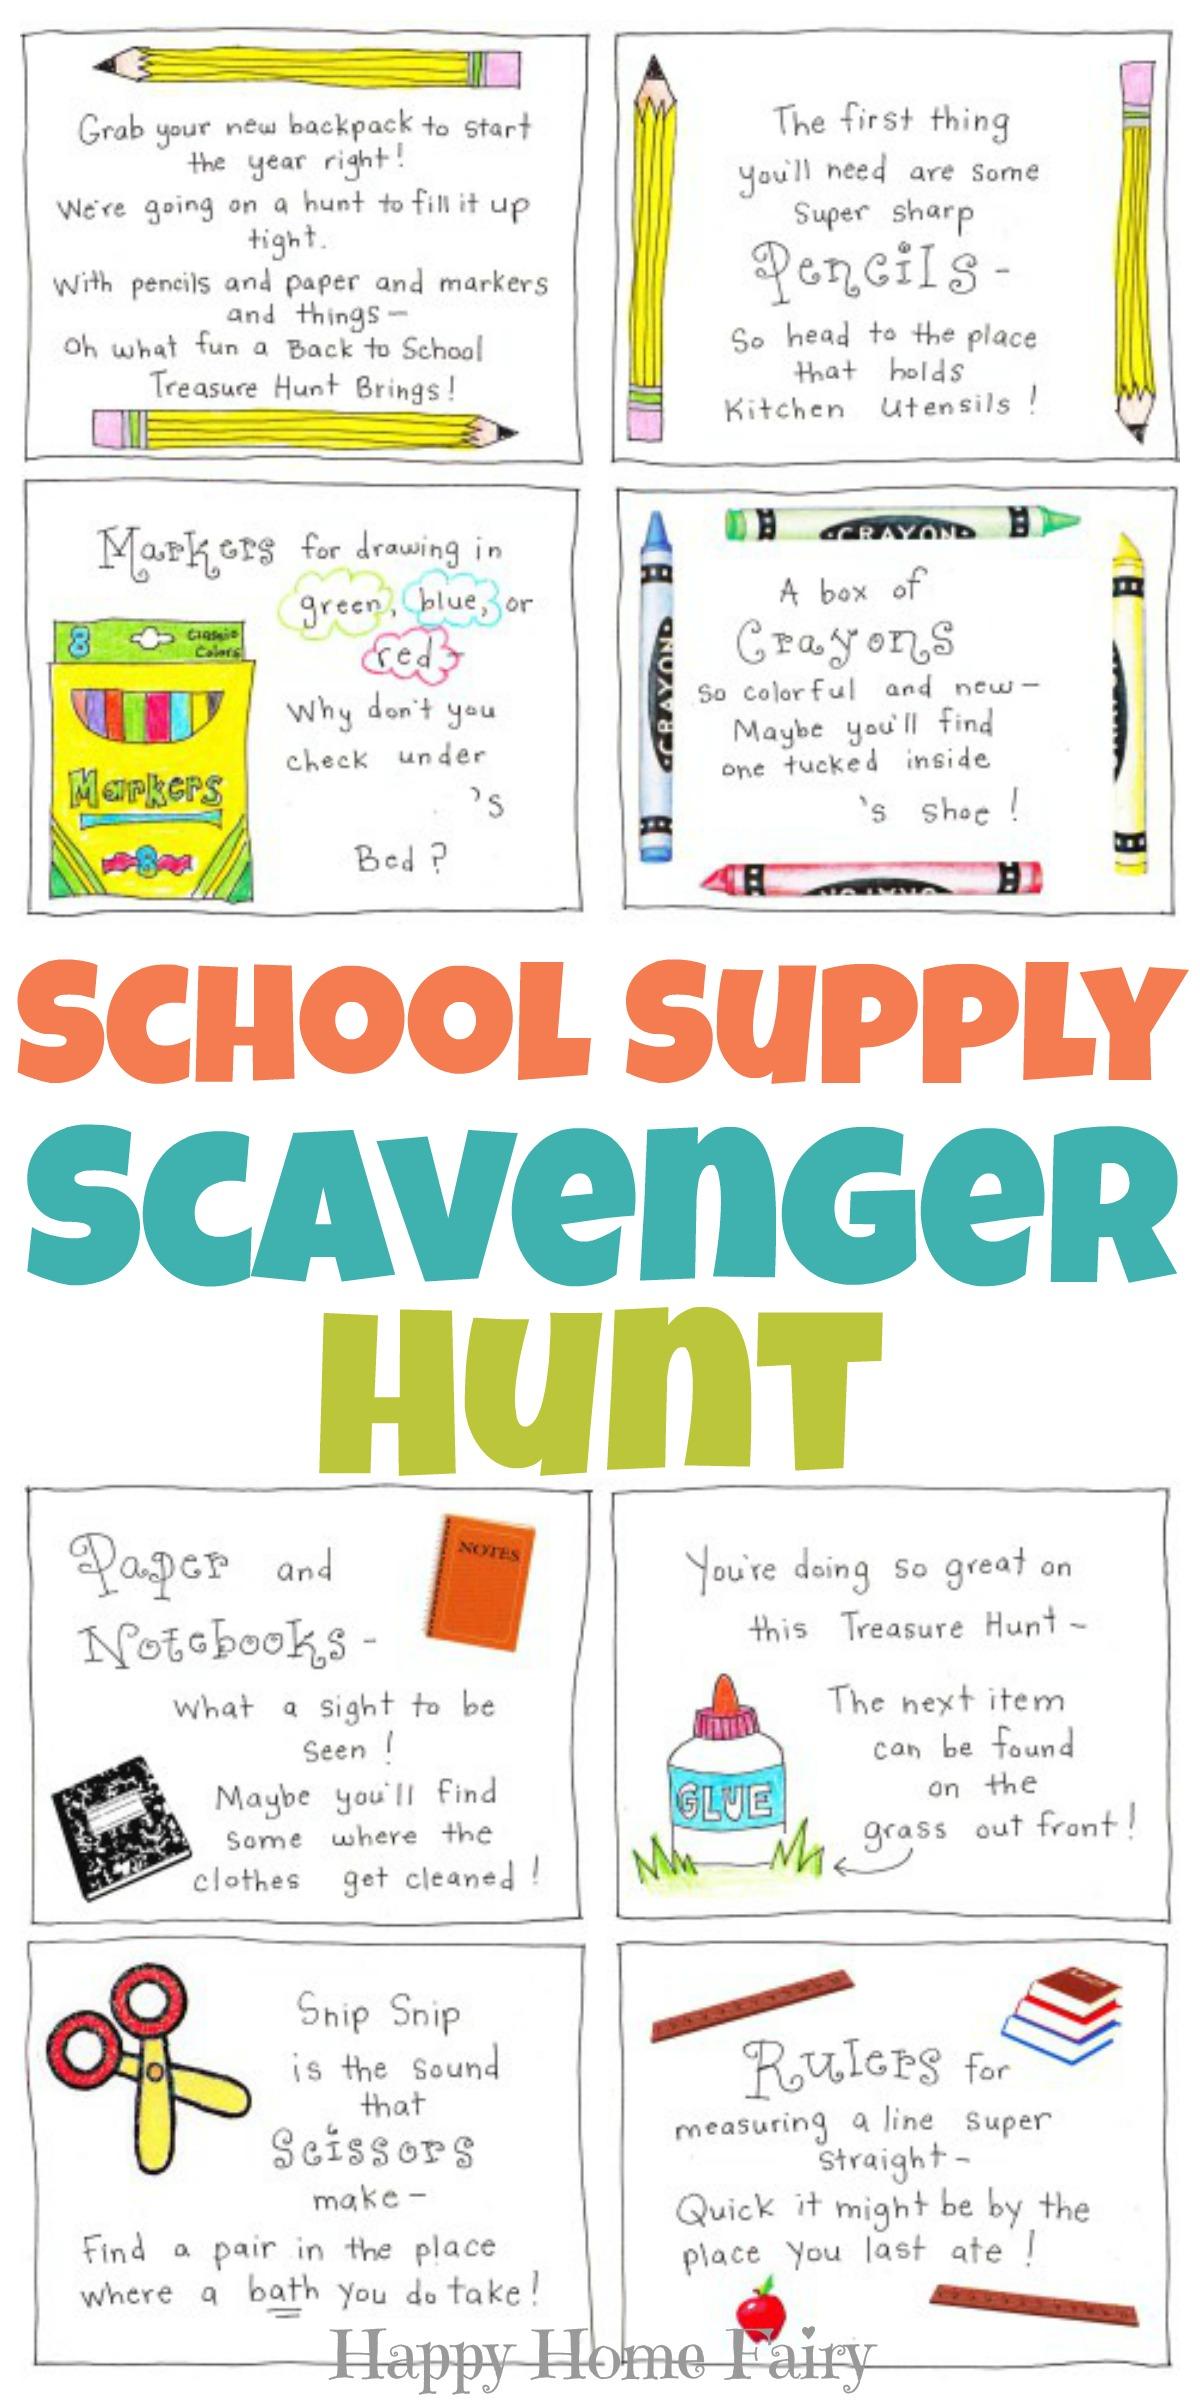 image about Free Printable Scavenger Hunt identify College or university Offer Scavenger Hunt - Totally free Printable! - Joyful Property